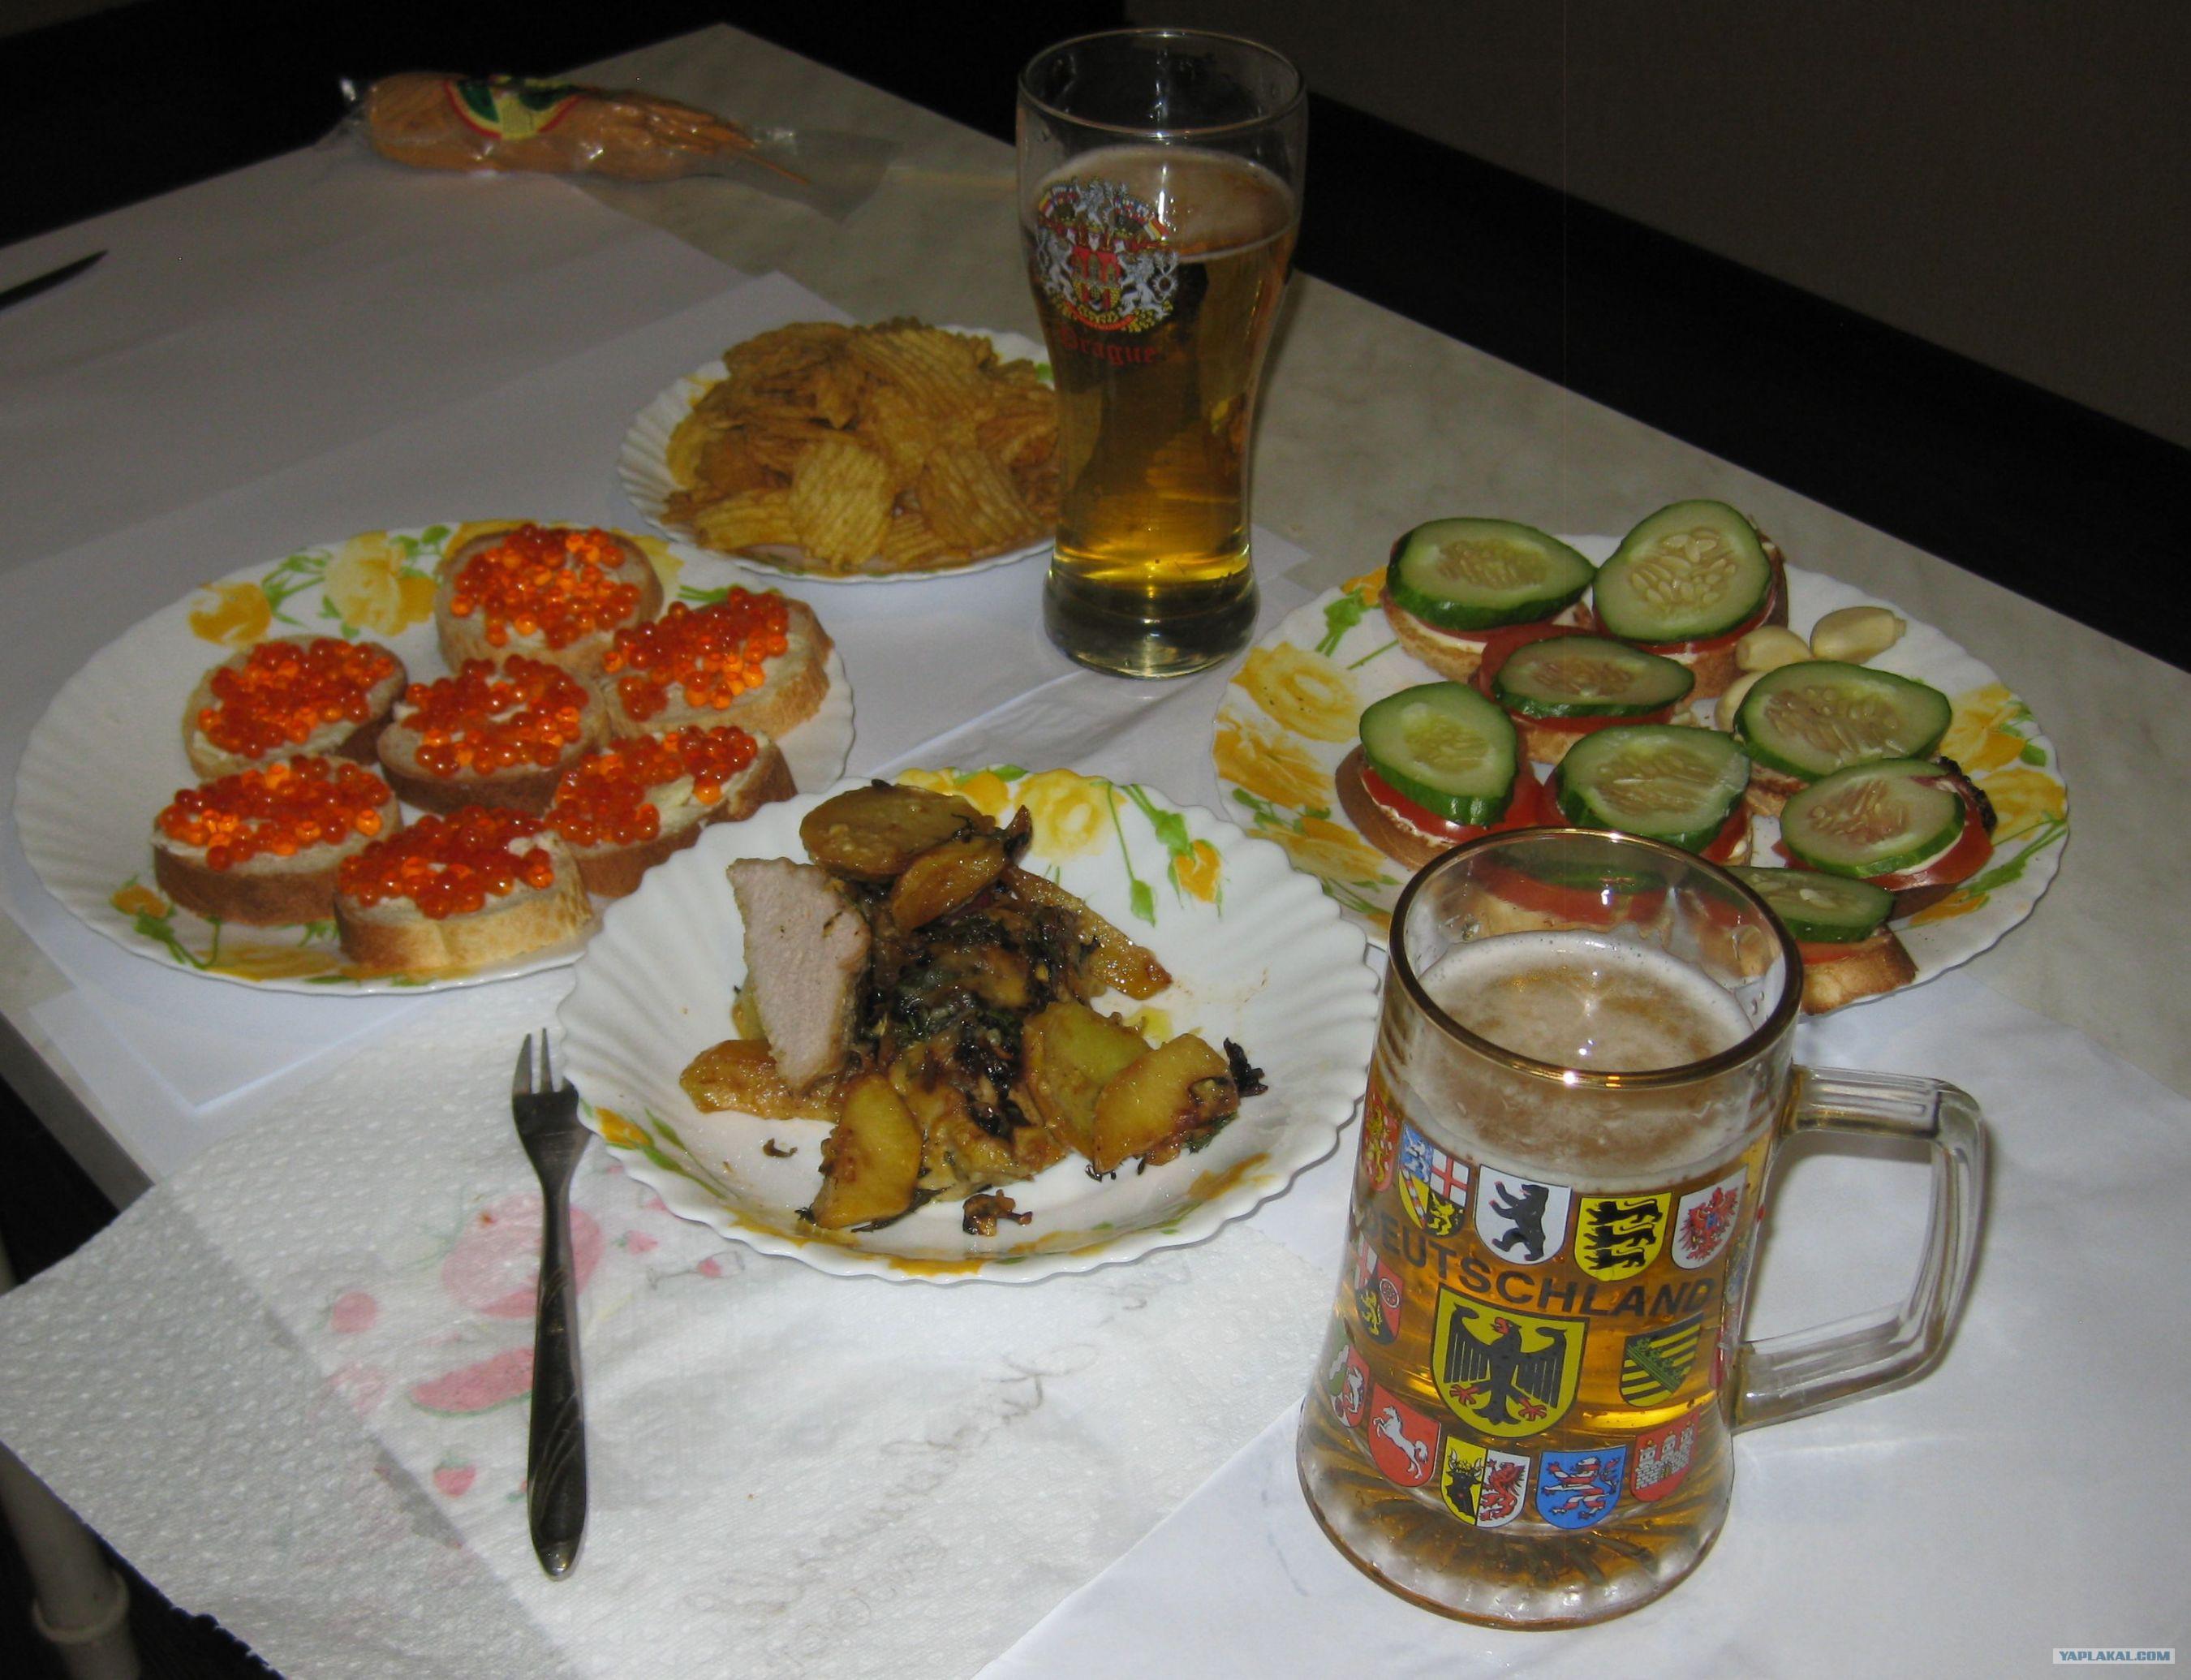 Закуска под пиво в домашних условиях